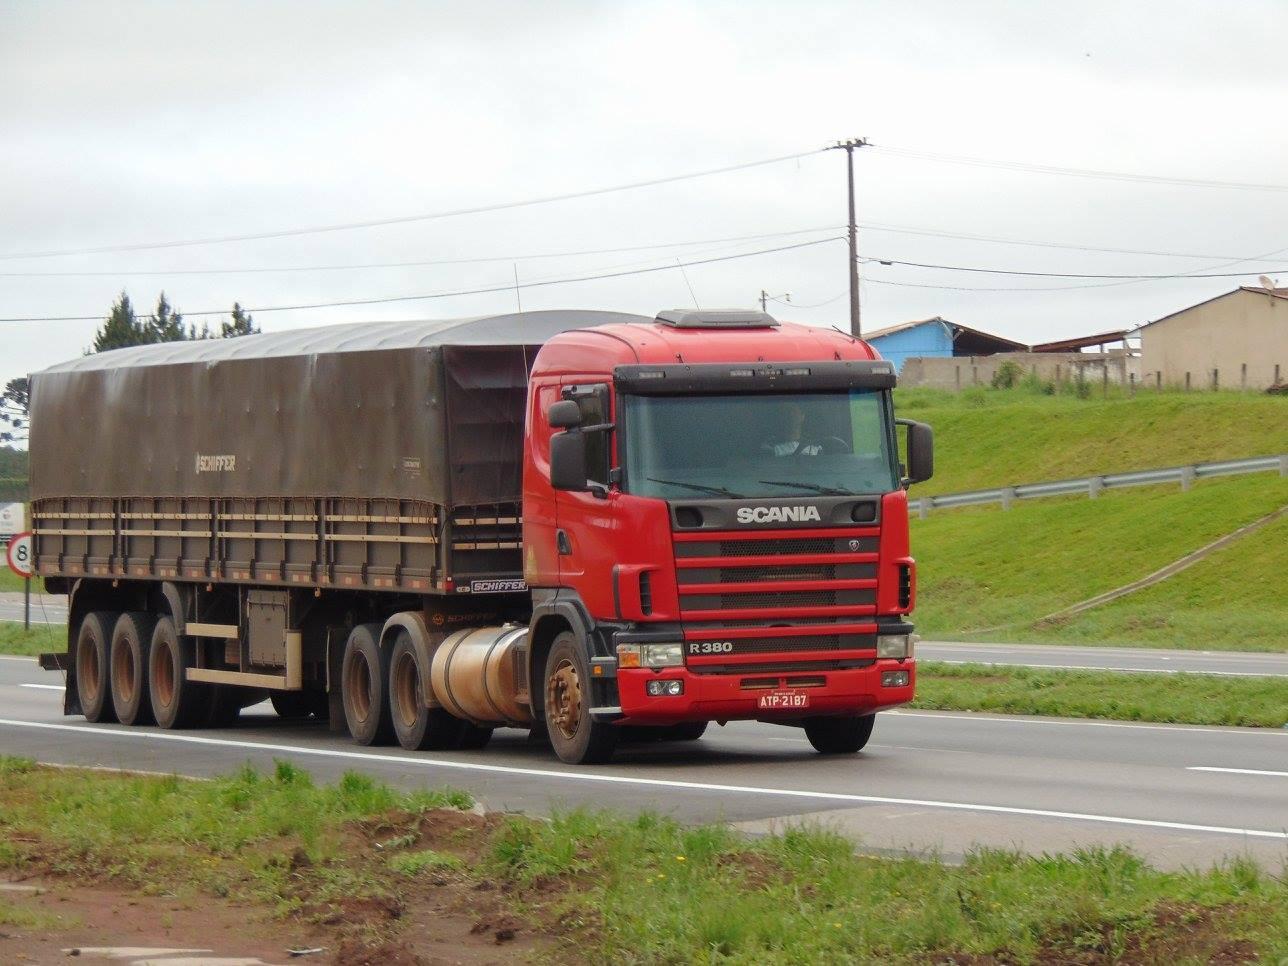 Scania-photo-5-1--2015-28